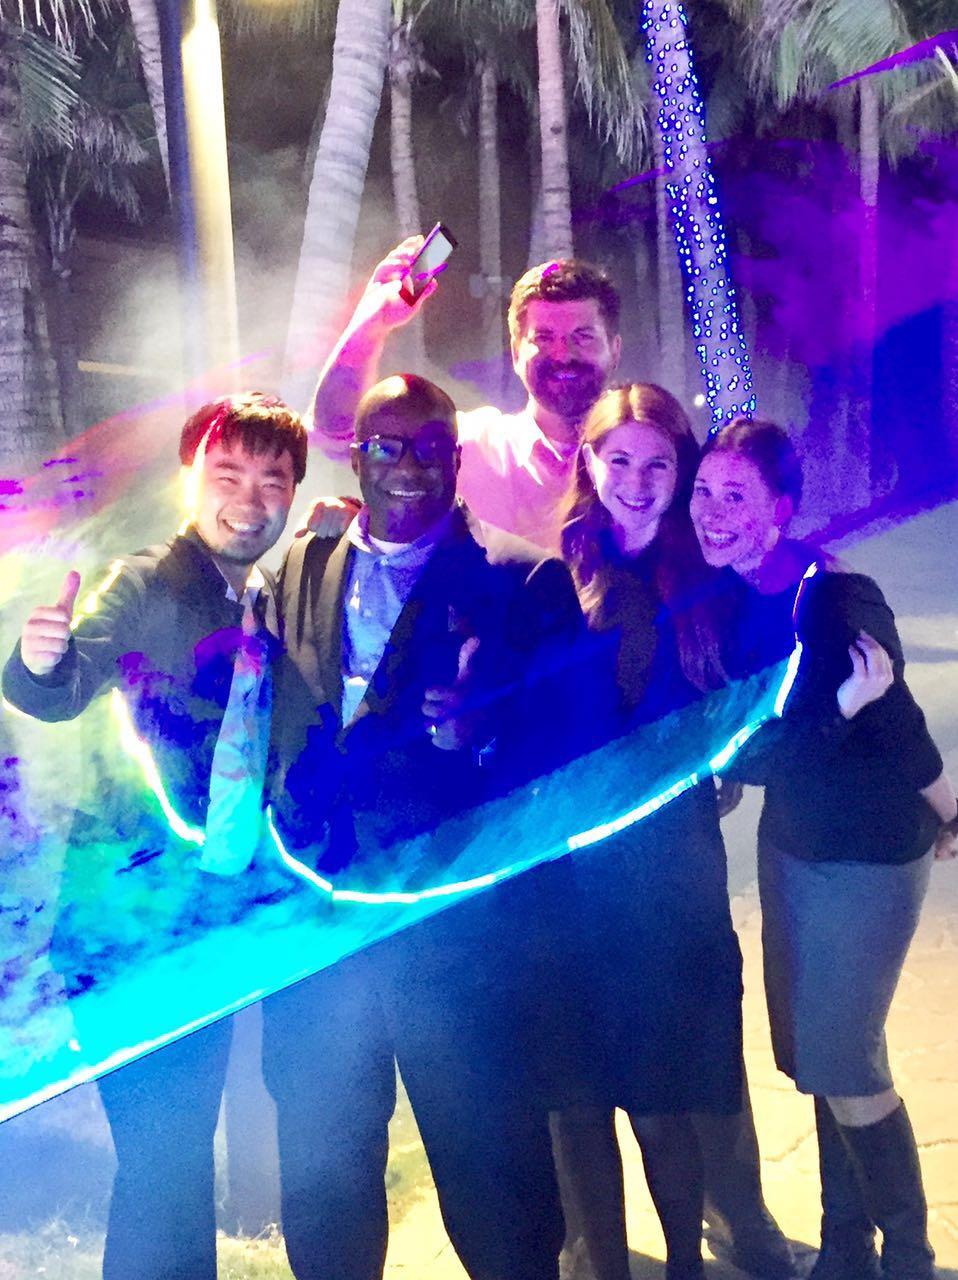 Laser light shows with our entrepreneur host